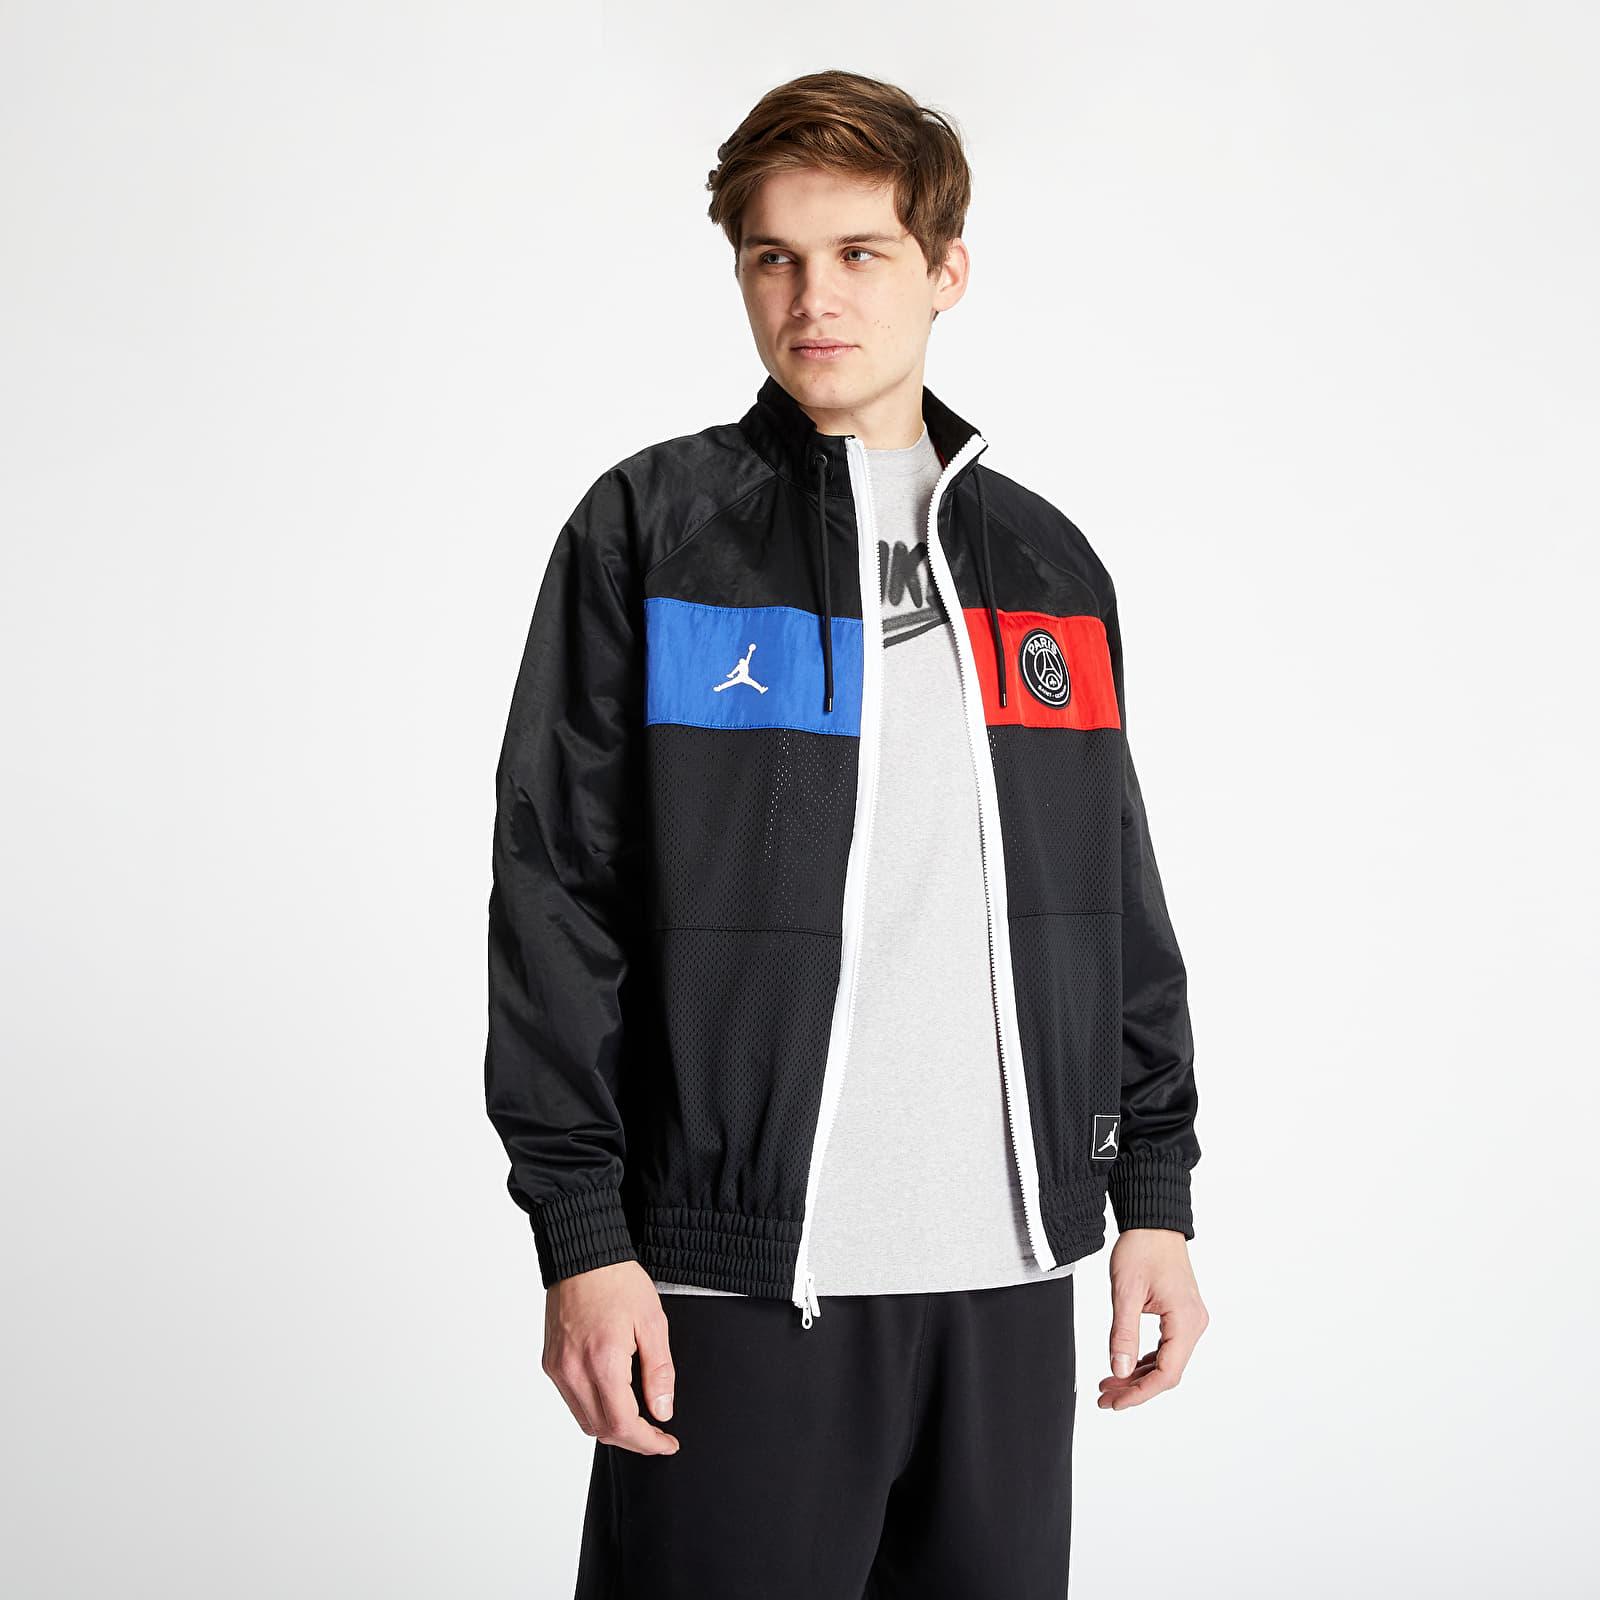 Jacken Jordan Paris Saint-Germain Air Jordan Suit Jacket Black/ Game Royal/ University Red